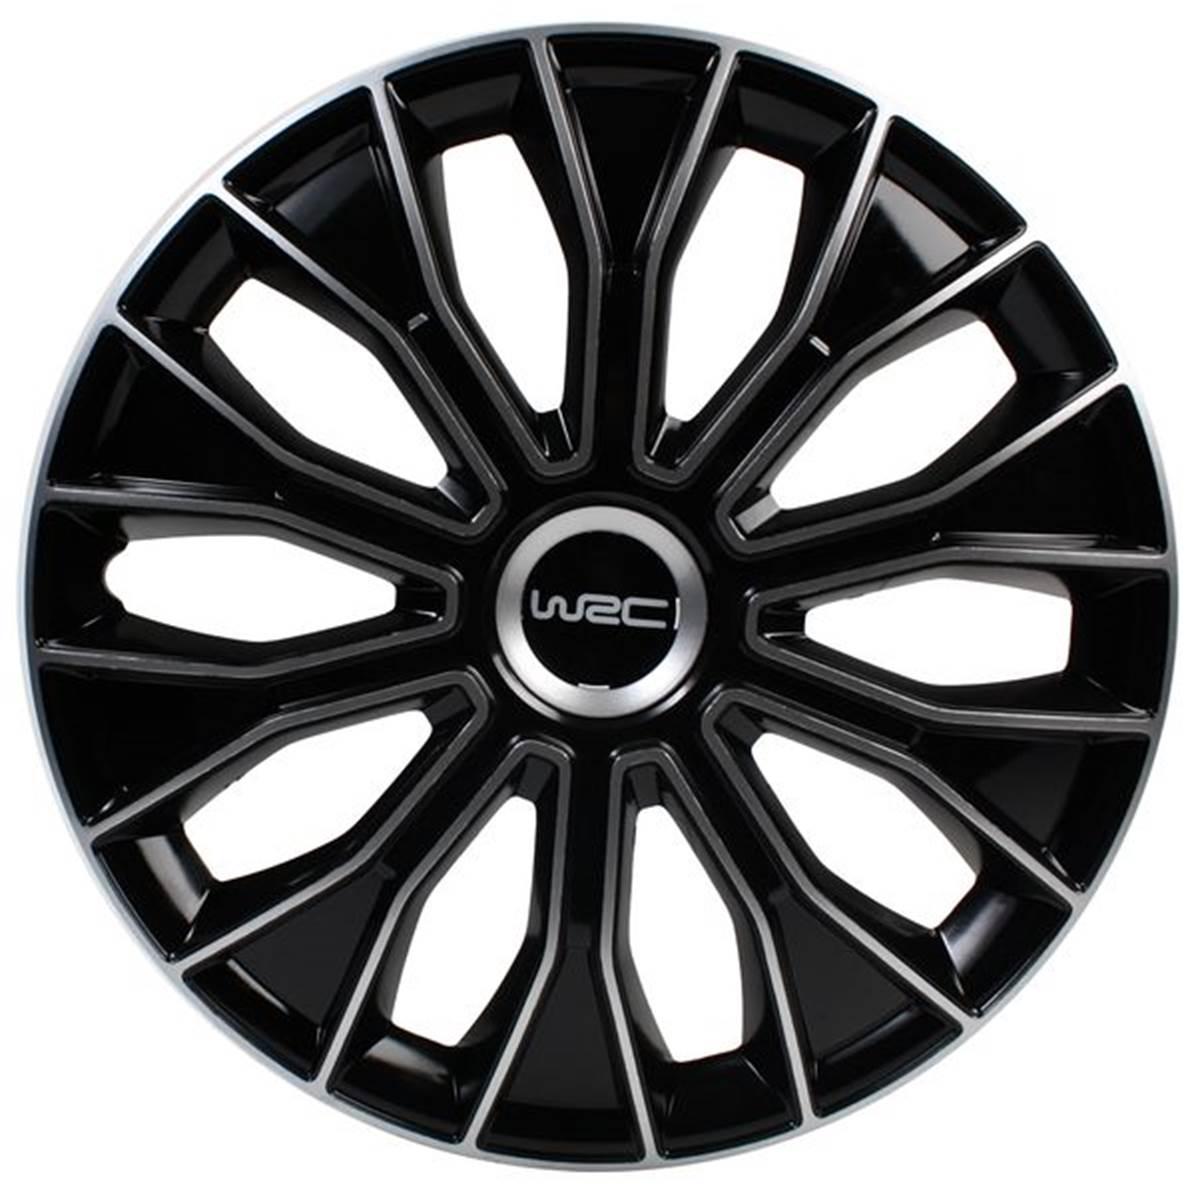 4 enjoliveurs WRC 14 N°15 Noir/Argent\